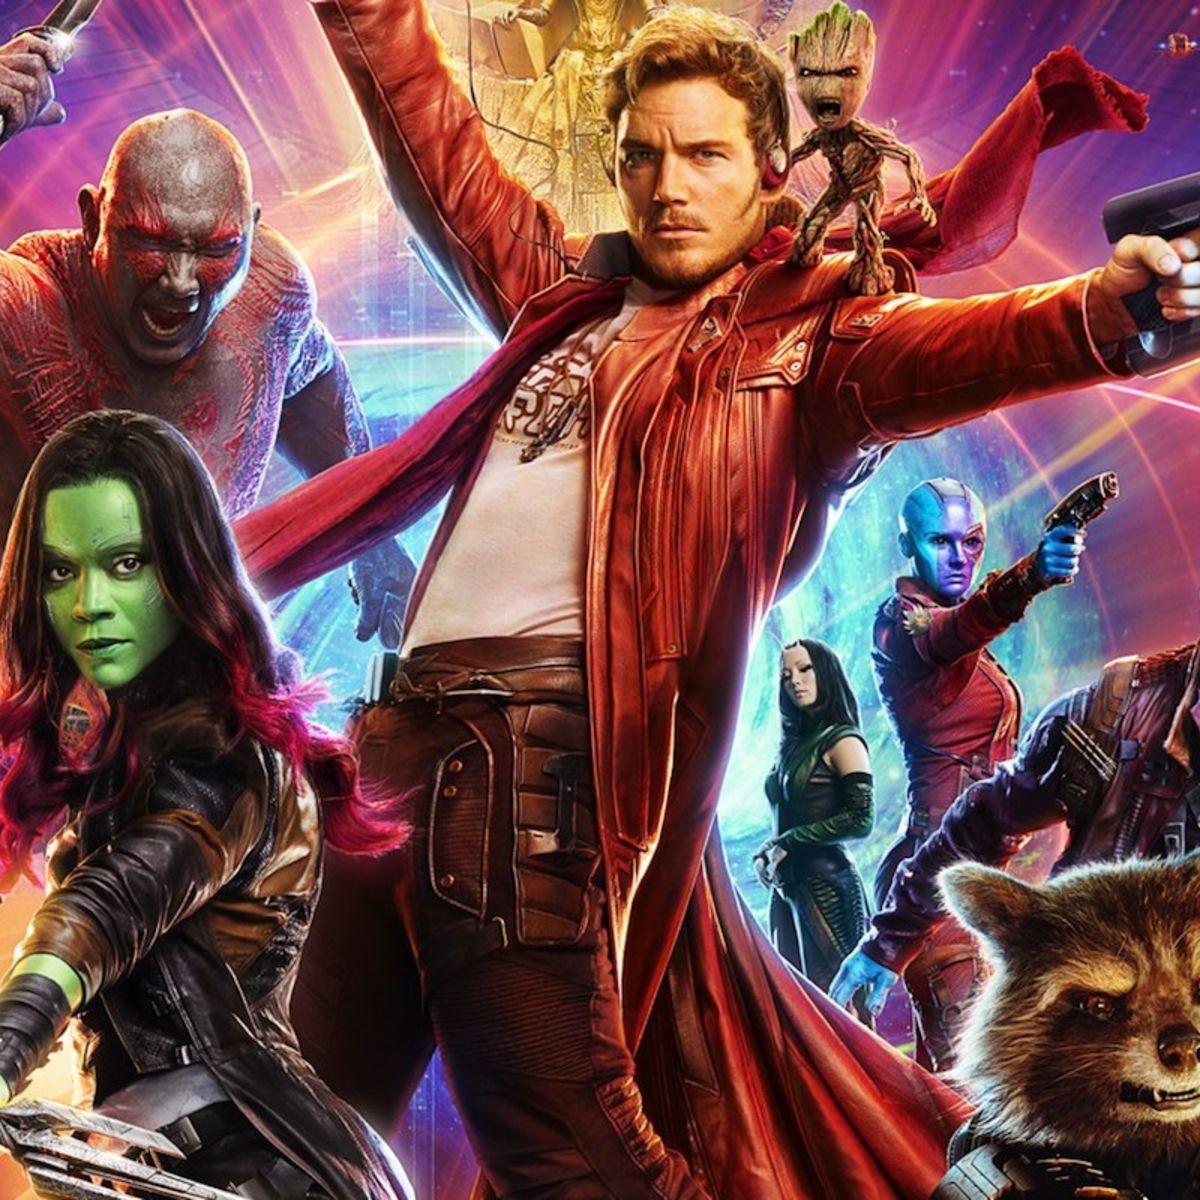 Guardians-of-the-Galaxy-Vol-2.jpg